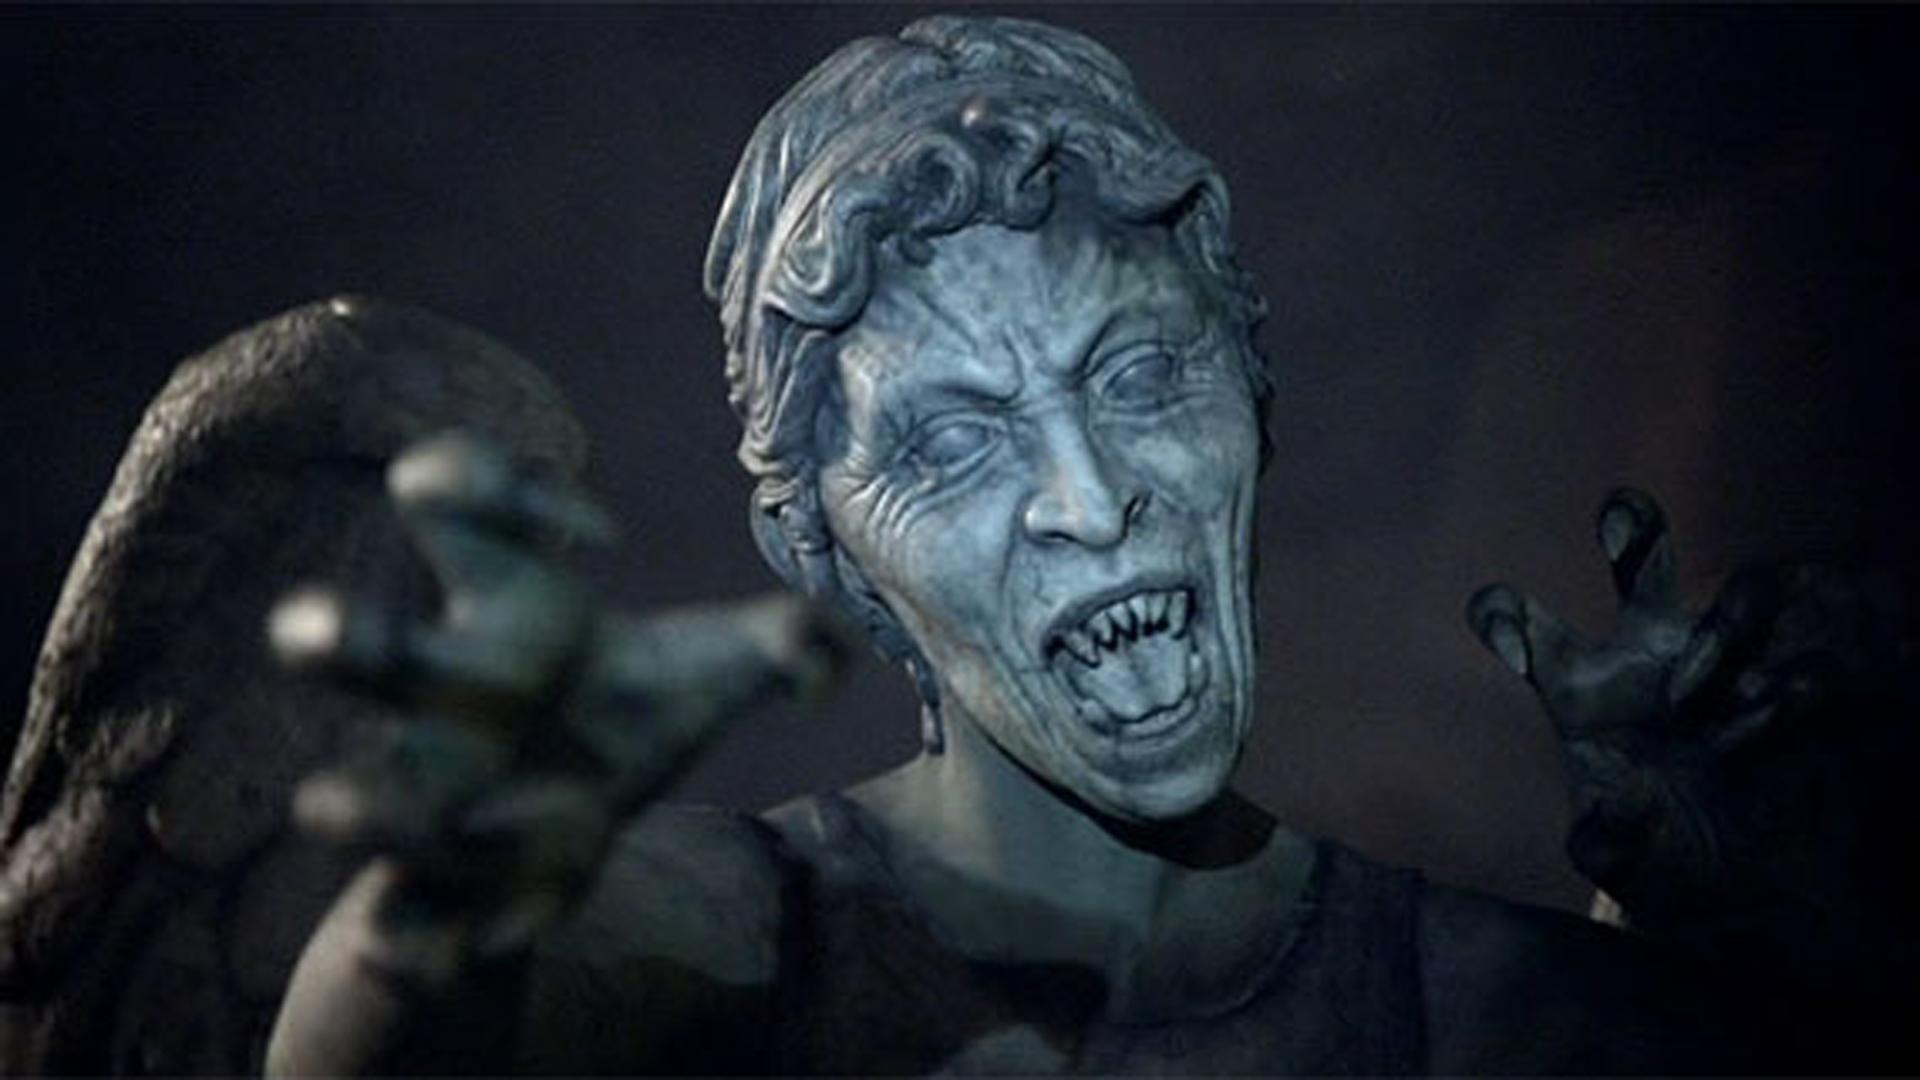 Weeping Angels Full HD Bakgrund and Bakgrund | 1920x1080 ...